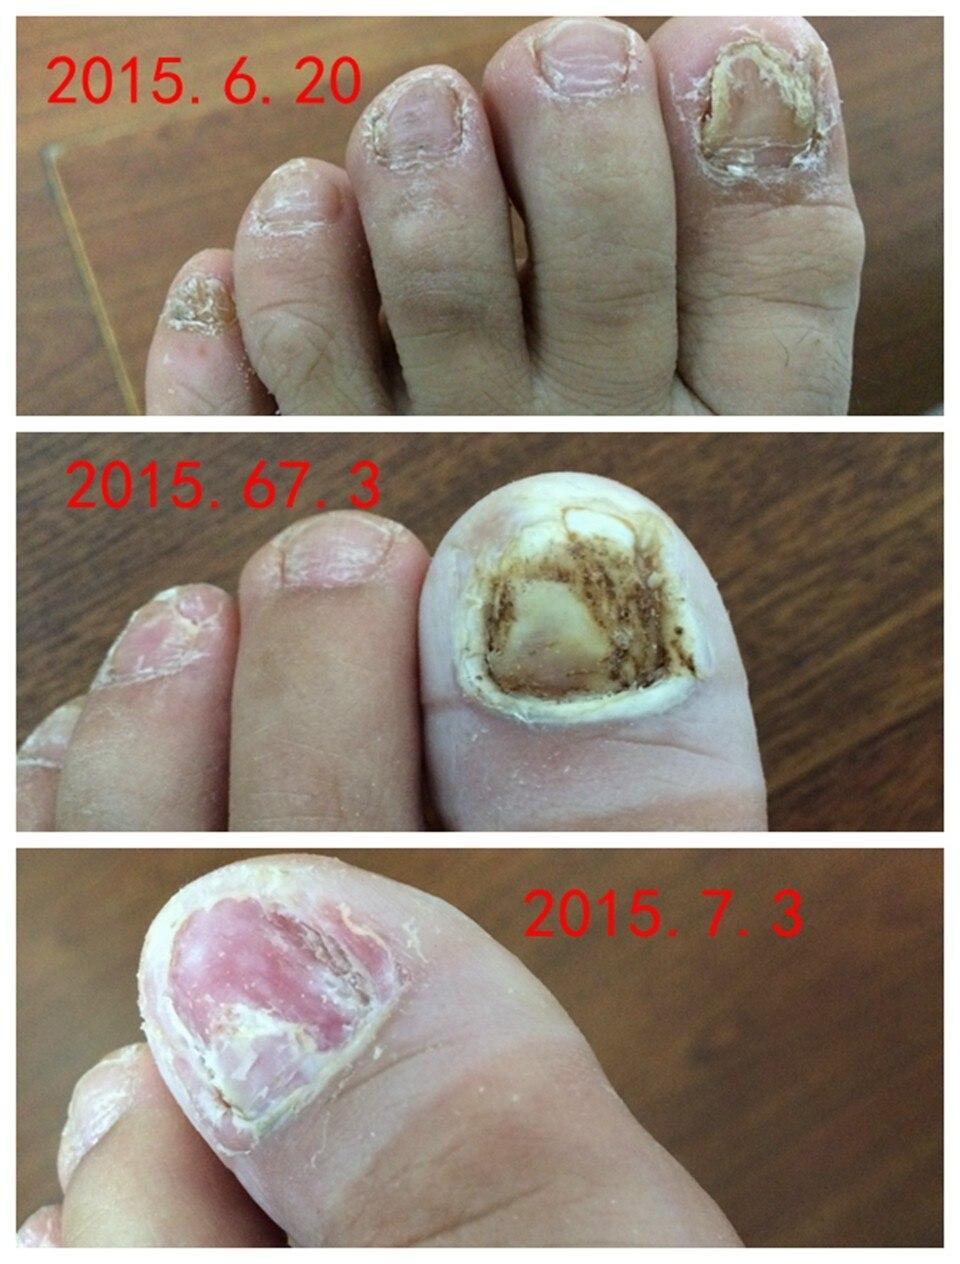 Toe Nail Fungus Treatment Of Chinese Medicine Herbs Anti Fungal ...